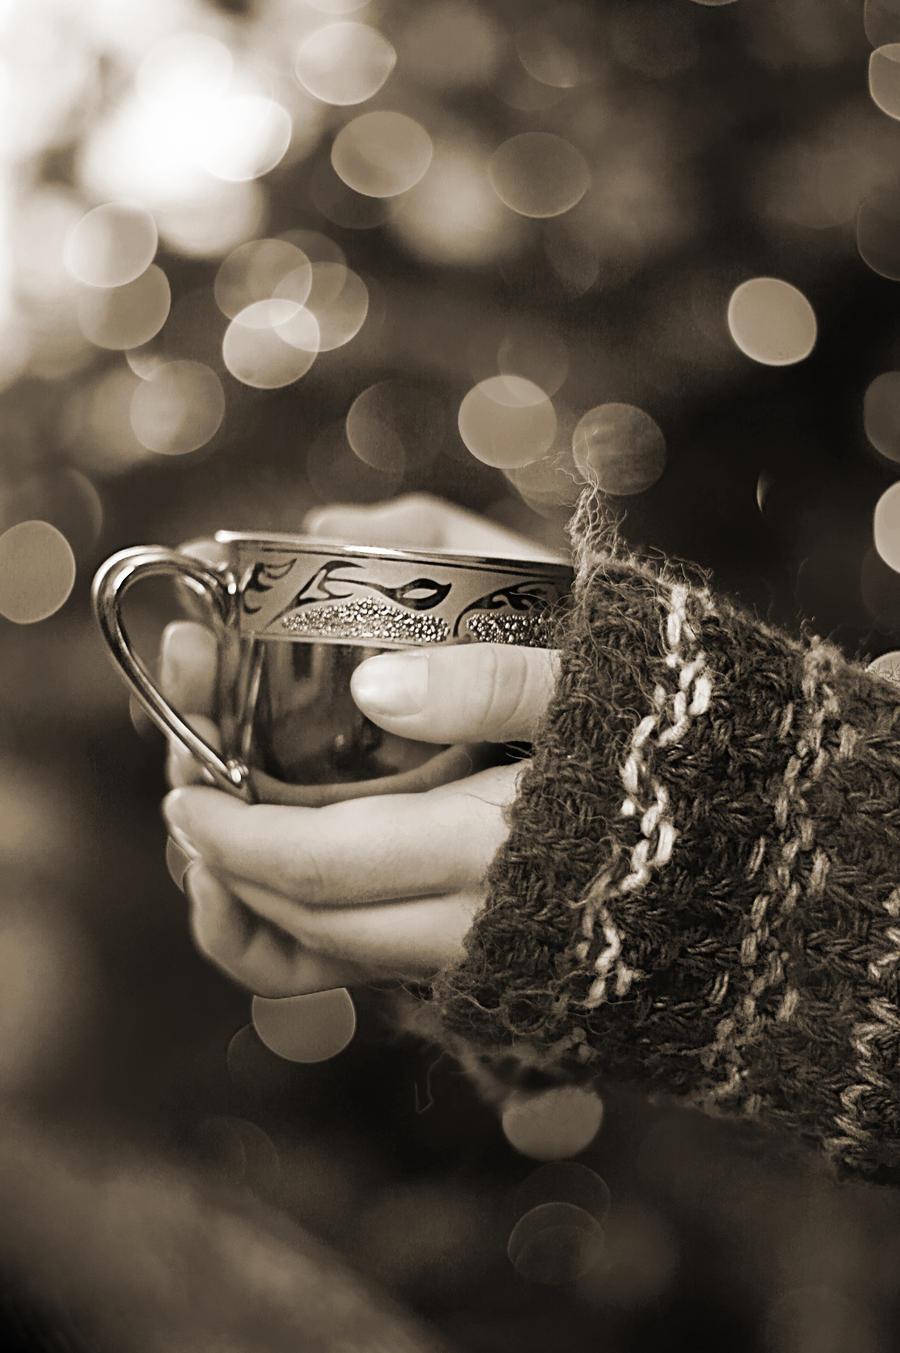 Morning tea by geory